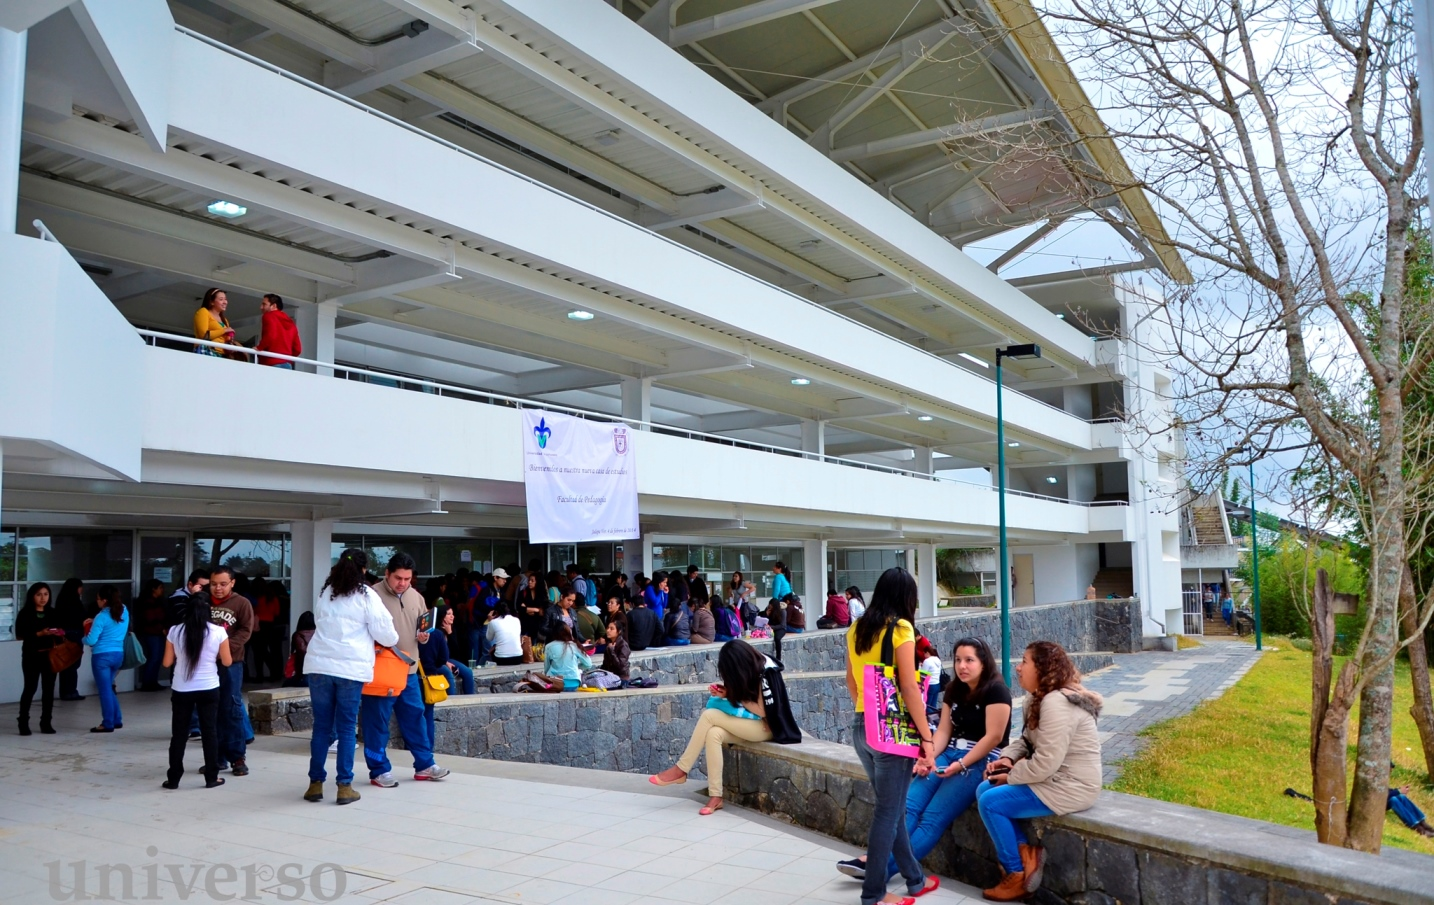 Pedagog a uv contin a sus labores acad micas for Universidades en xalapa